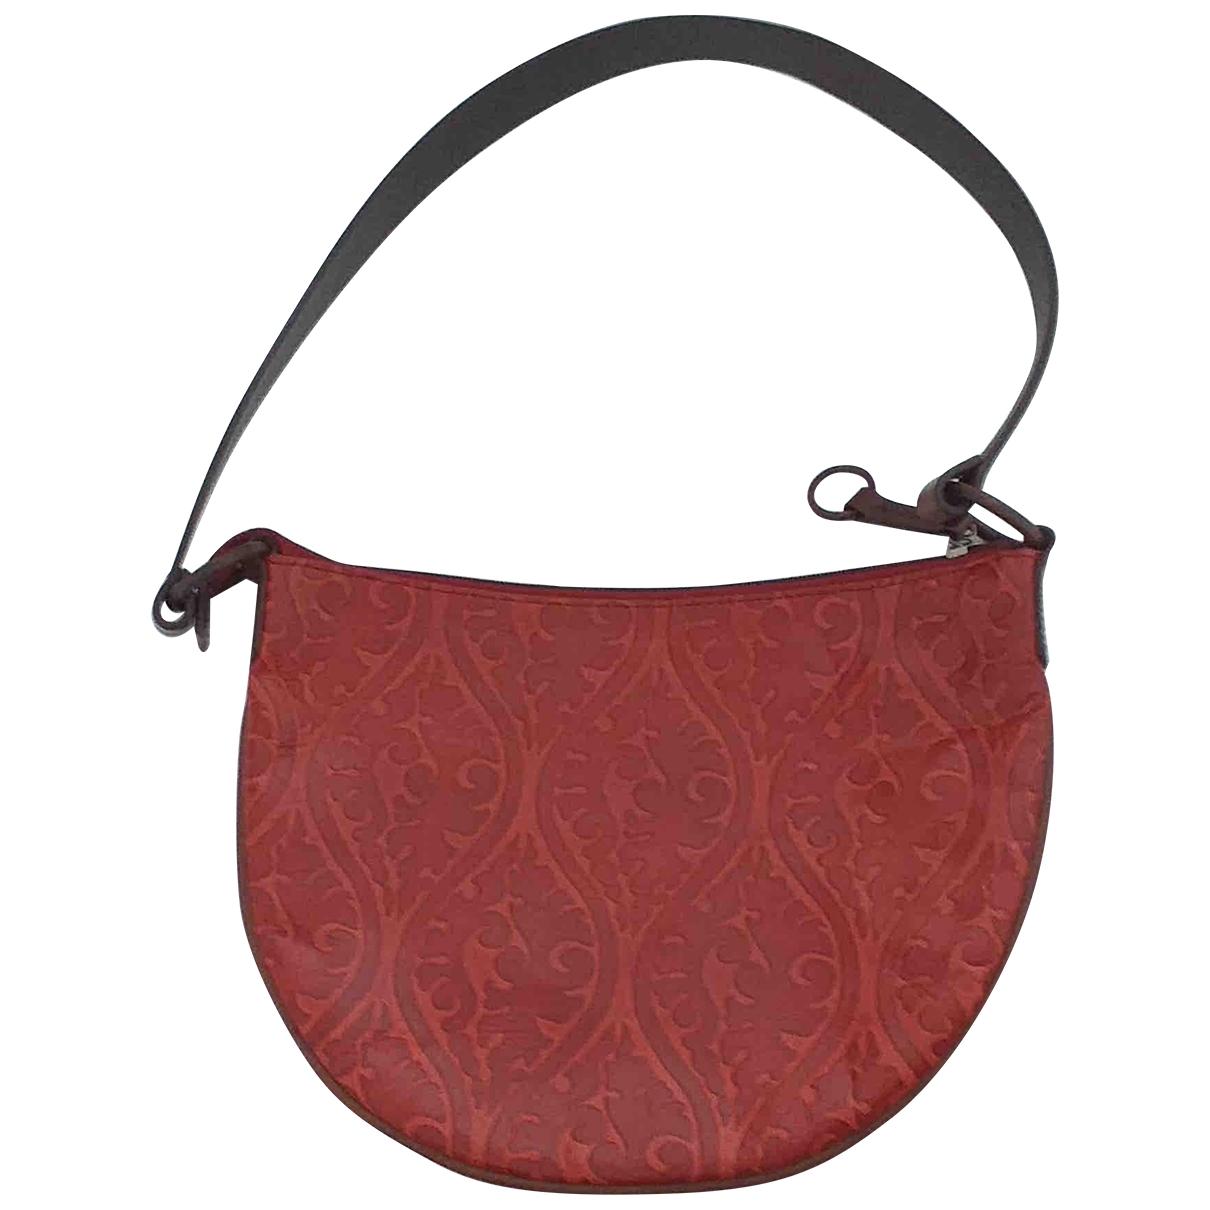 Dkny \N Leather handbag for Women \N